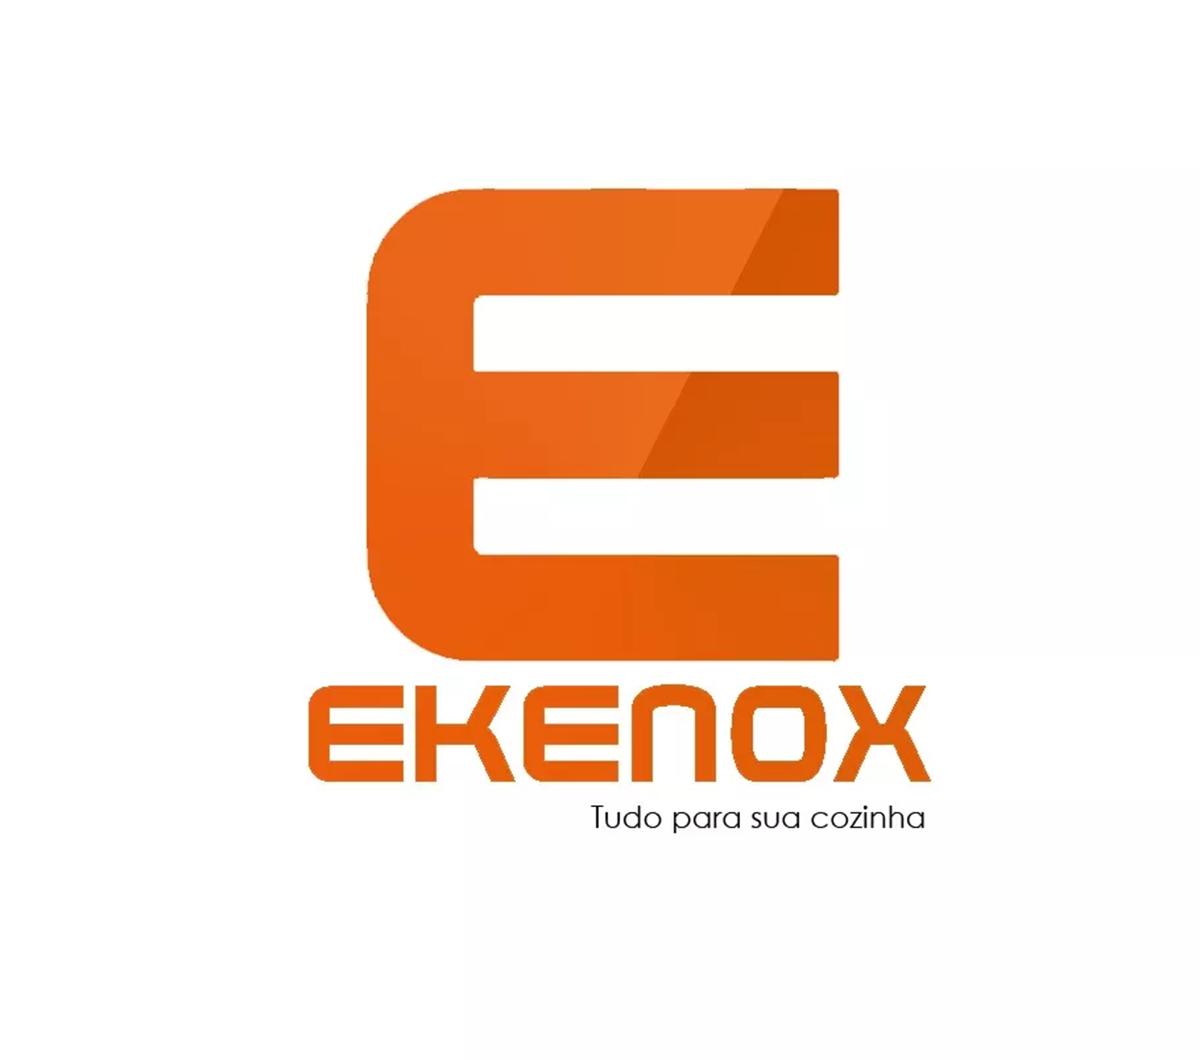 MESA INOX PE BRANCO 140X70CM PG  - EKENOX- Equipamentos Industriais